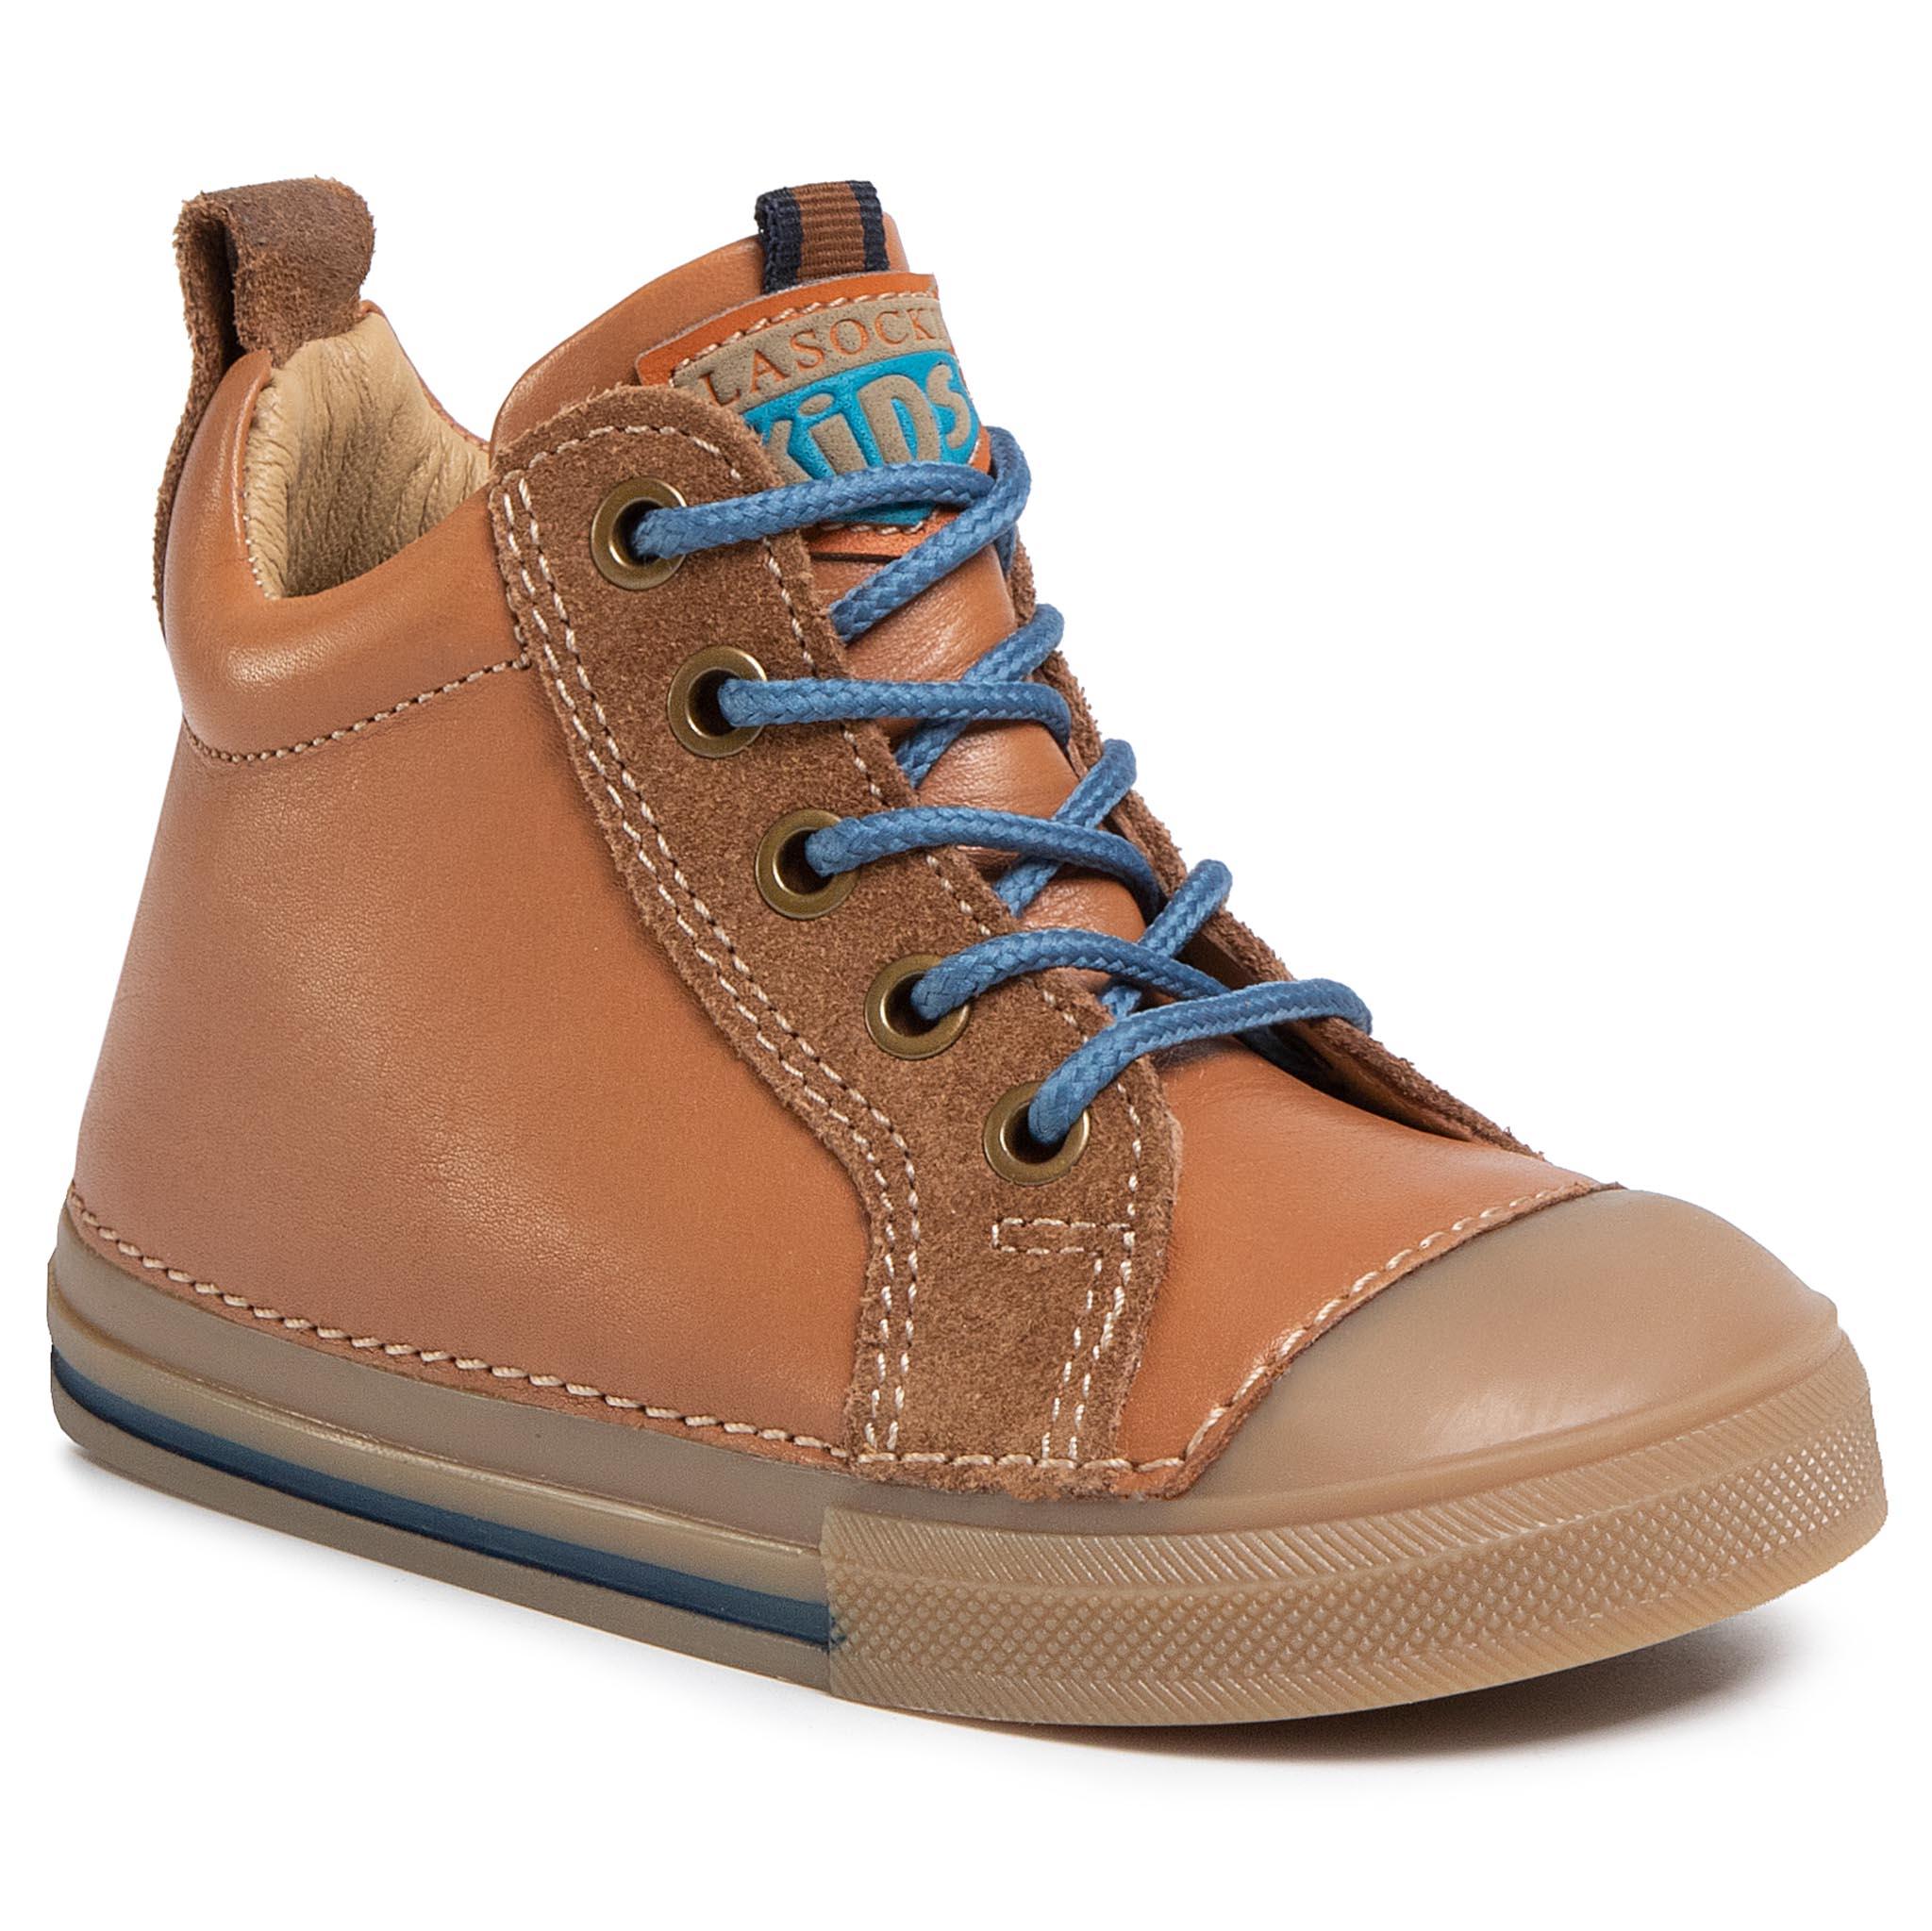 Outdoorová obuv LASOCKI KIDS - CI12-2916-04 Brown